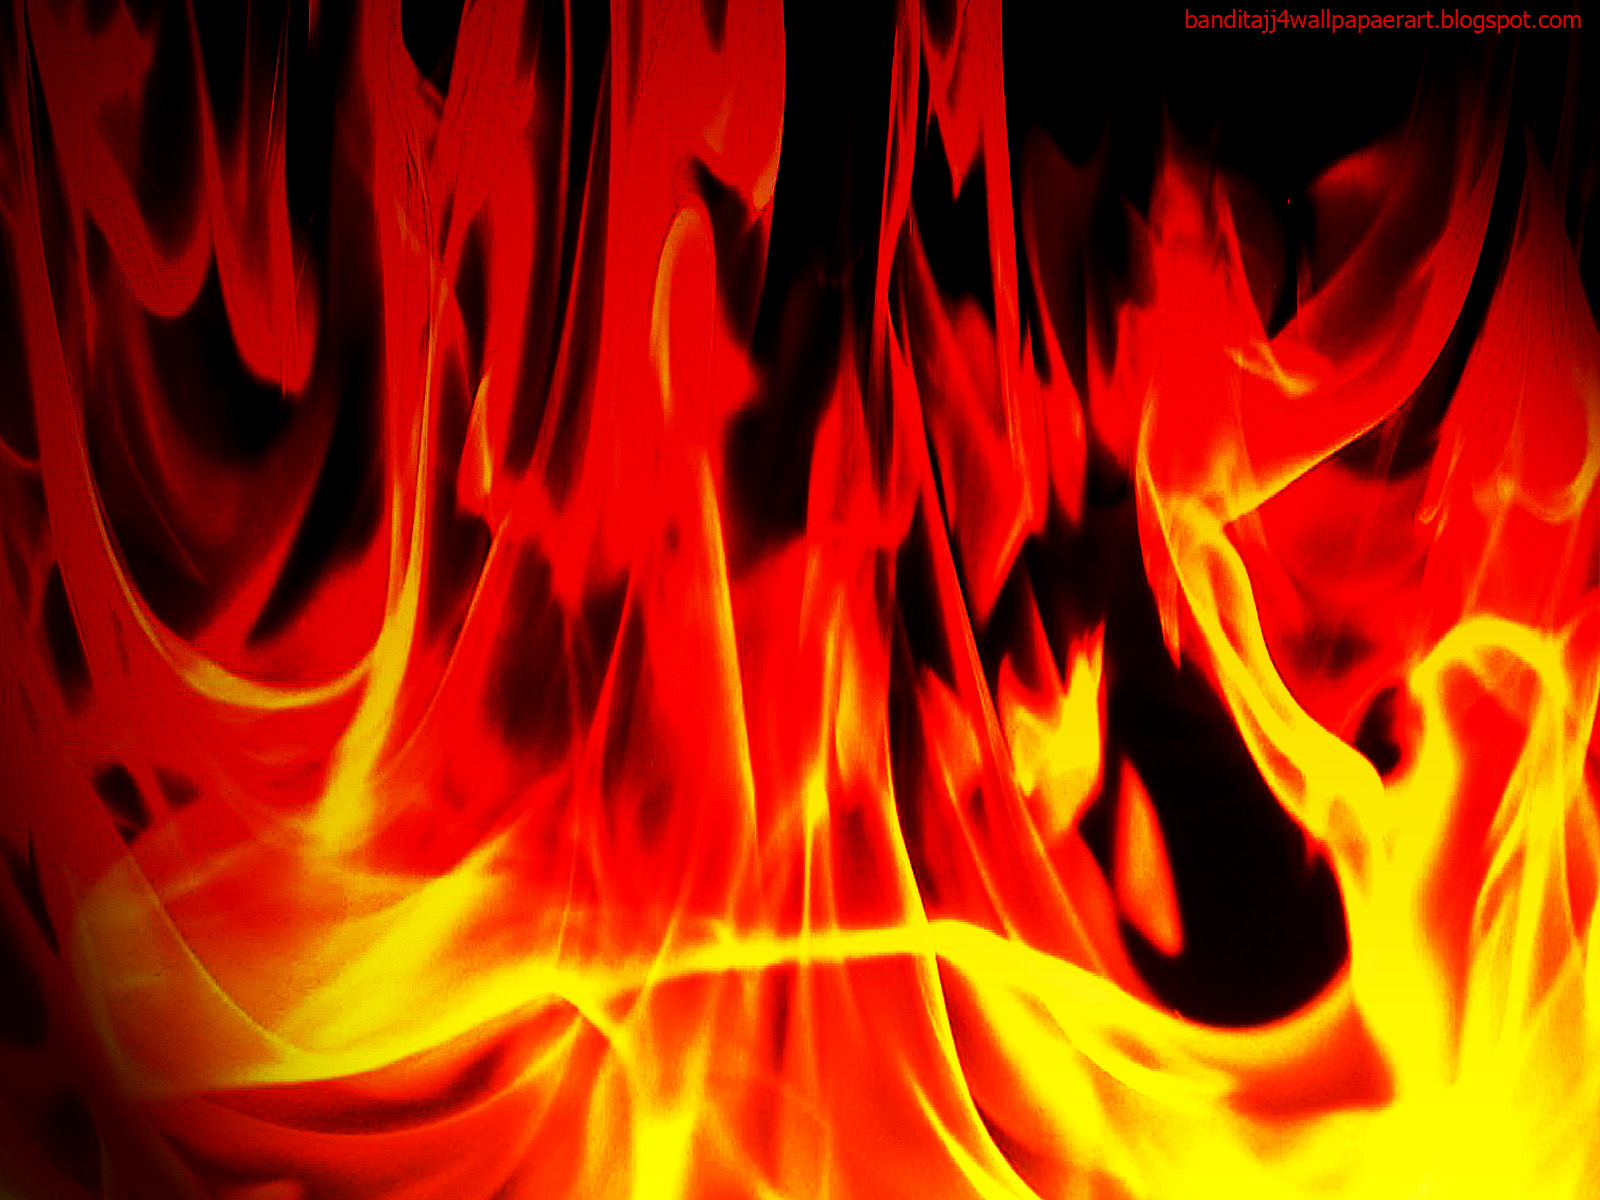 Fire Wallpaper Download 1600x1200